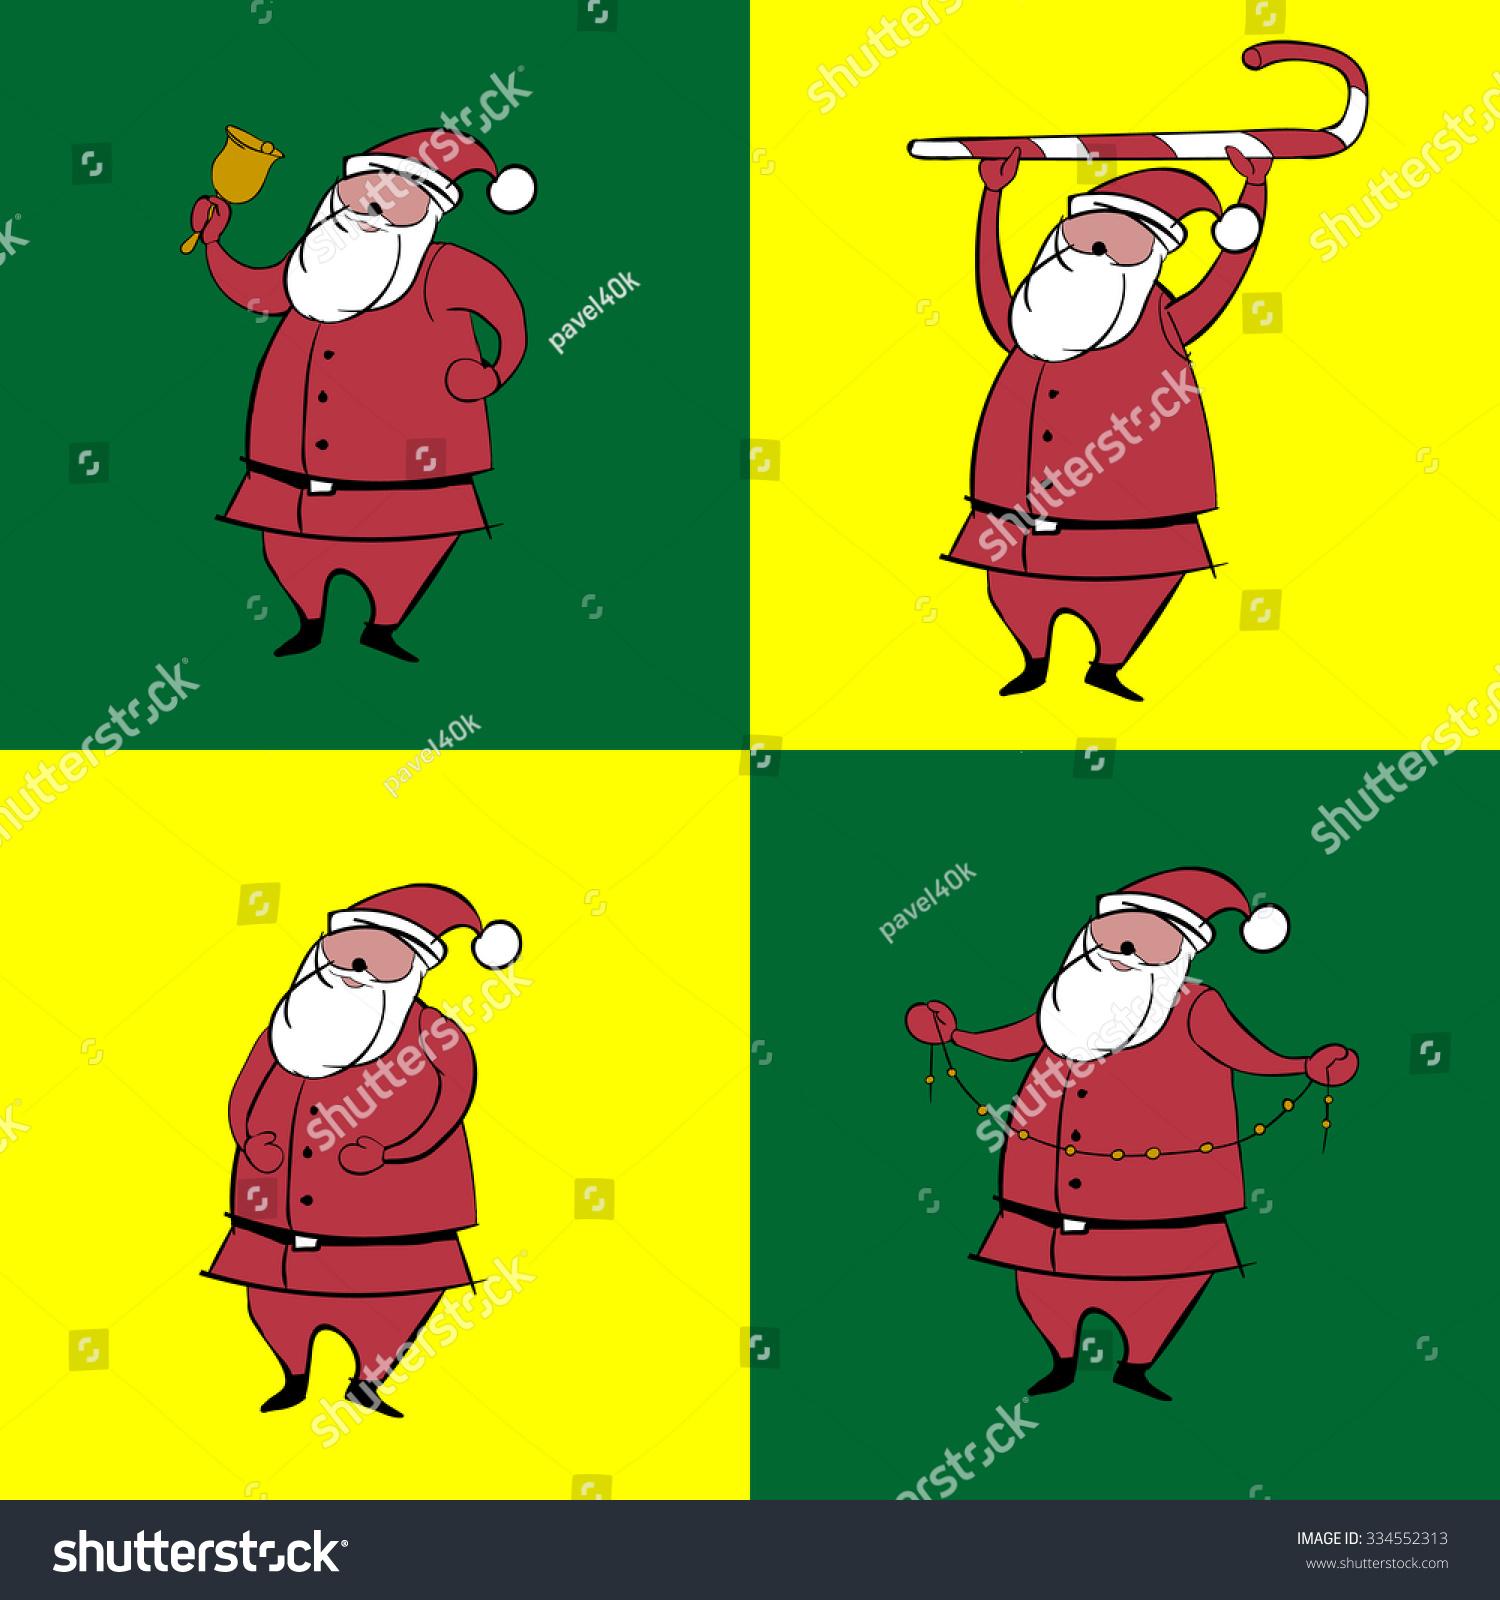 Merry Christmas Santa Claus Stock Vector 334552313 - Shutterstock